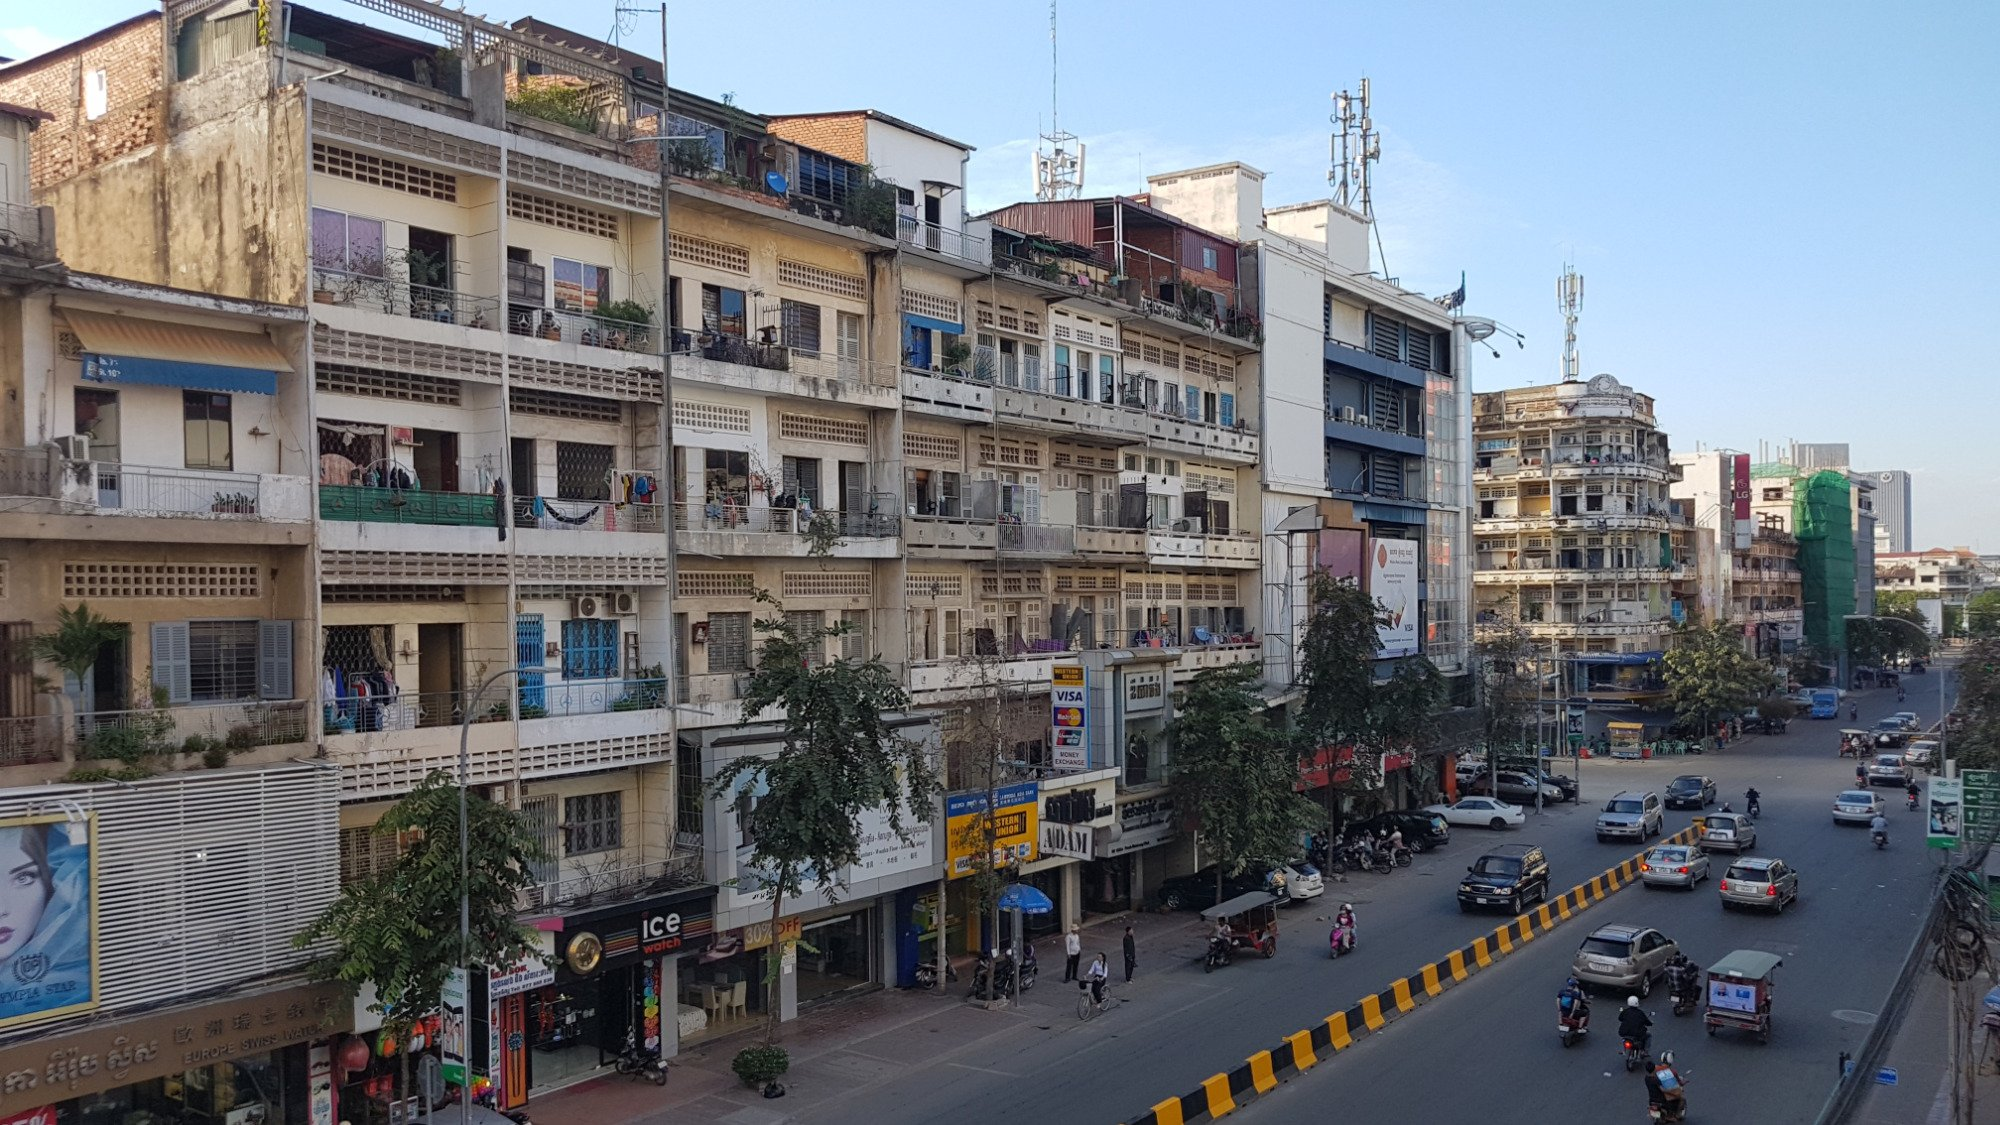 Diamond hotel   updated 2017 reviews & prices (phnom penh ...